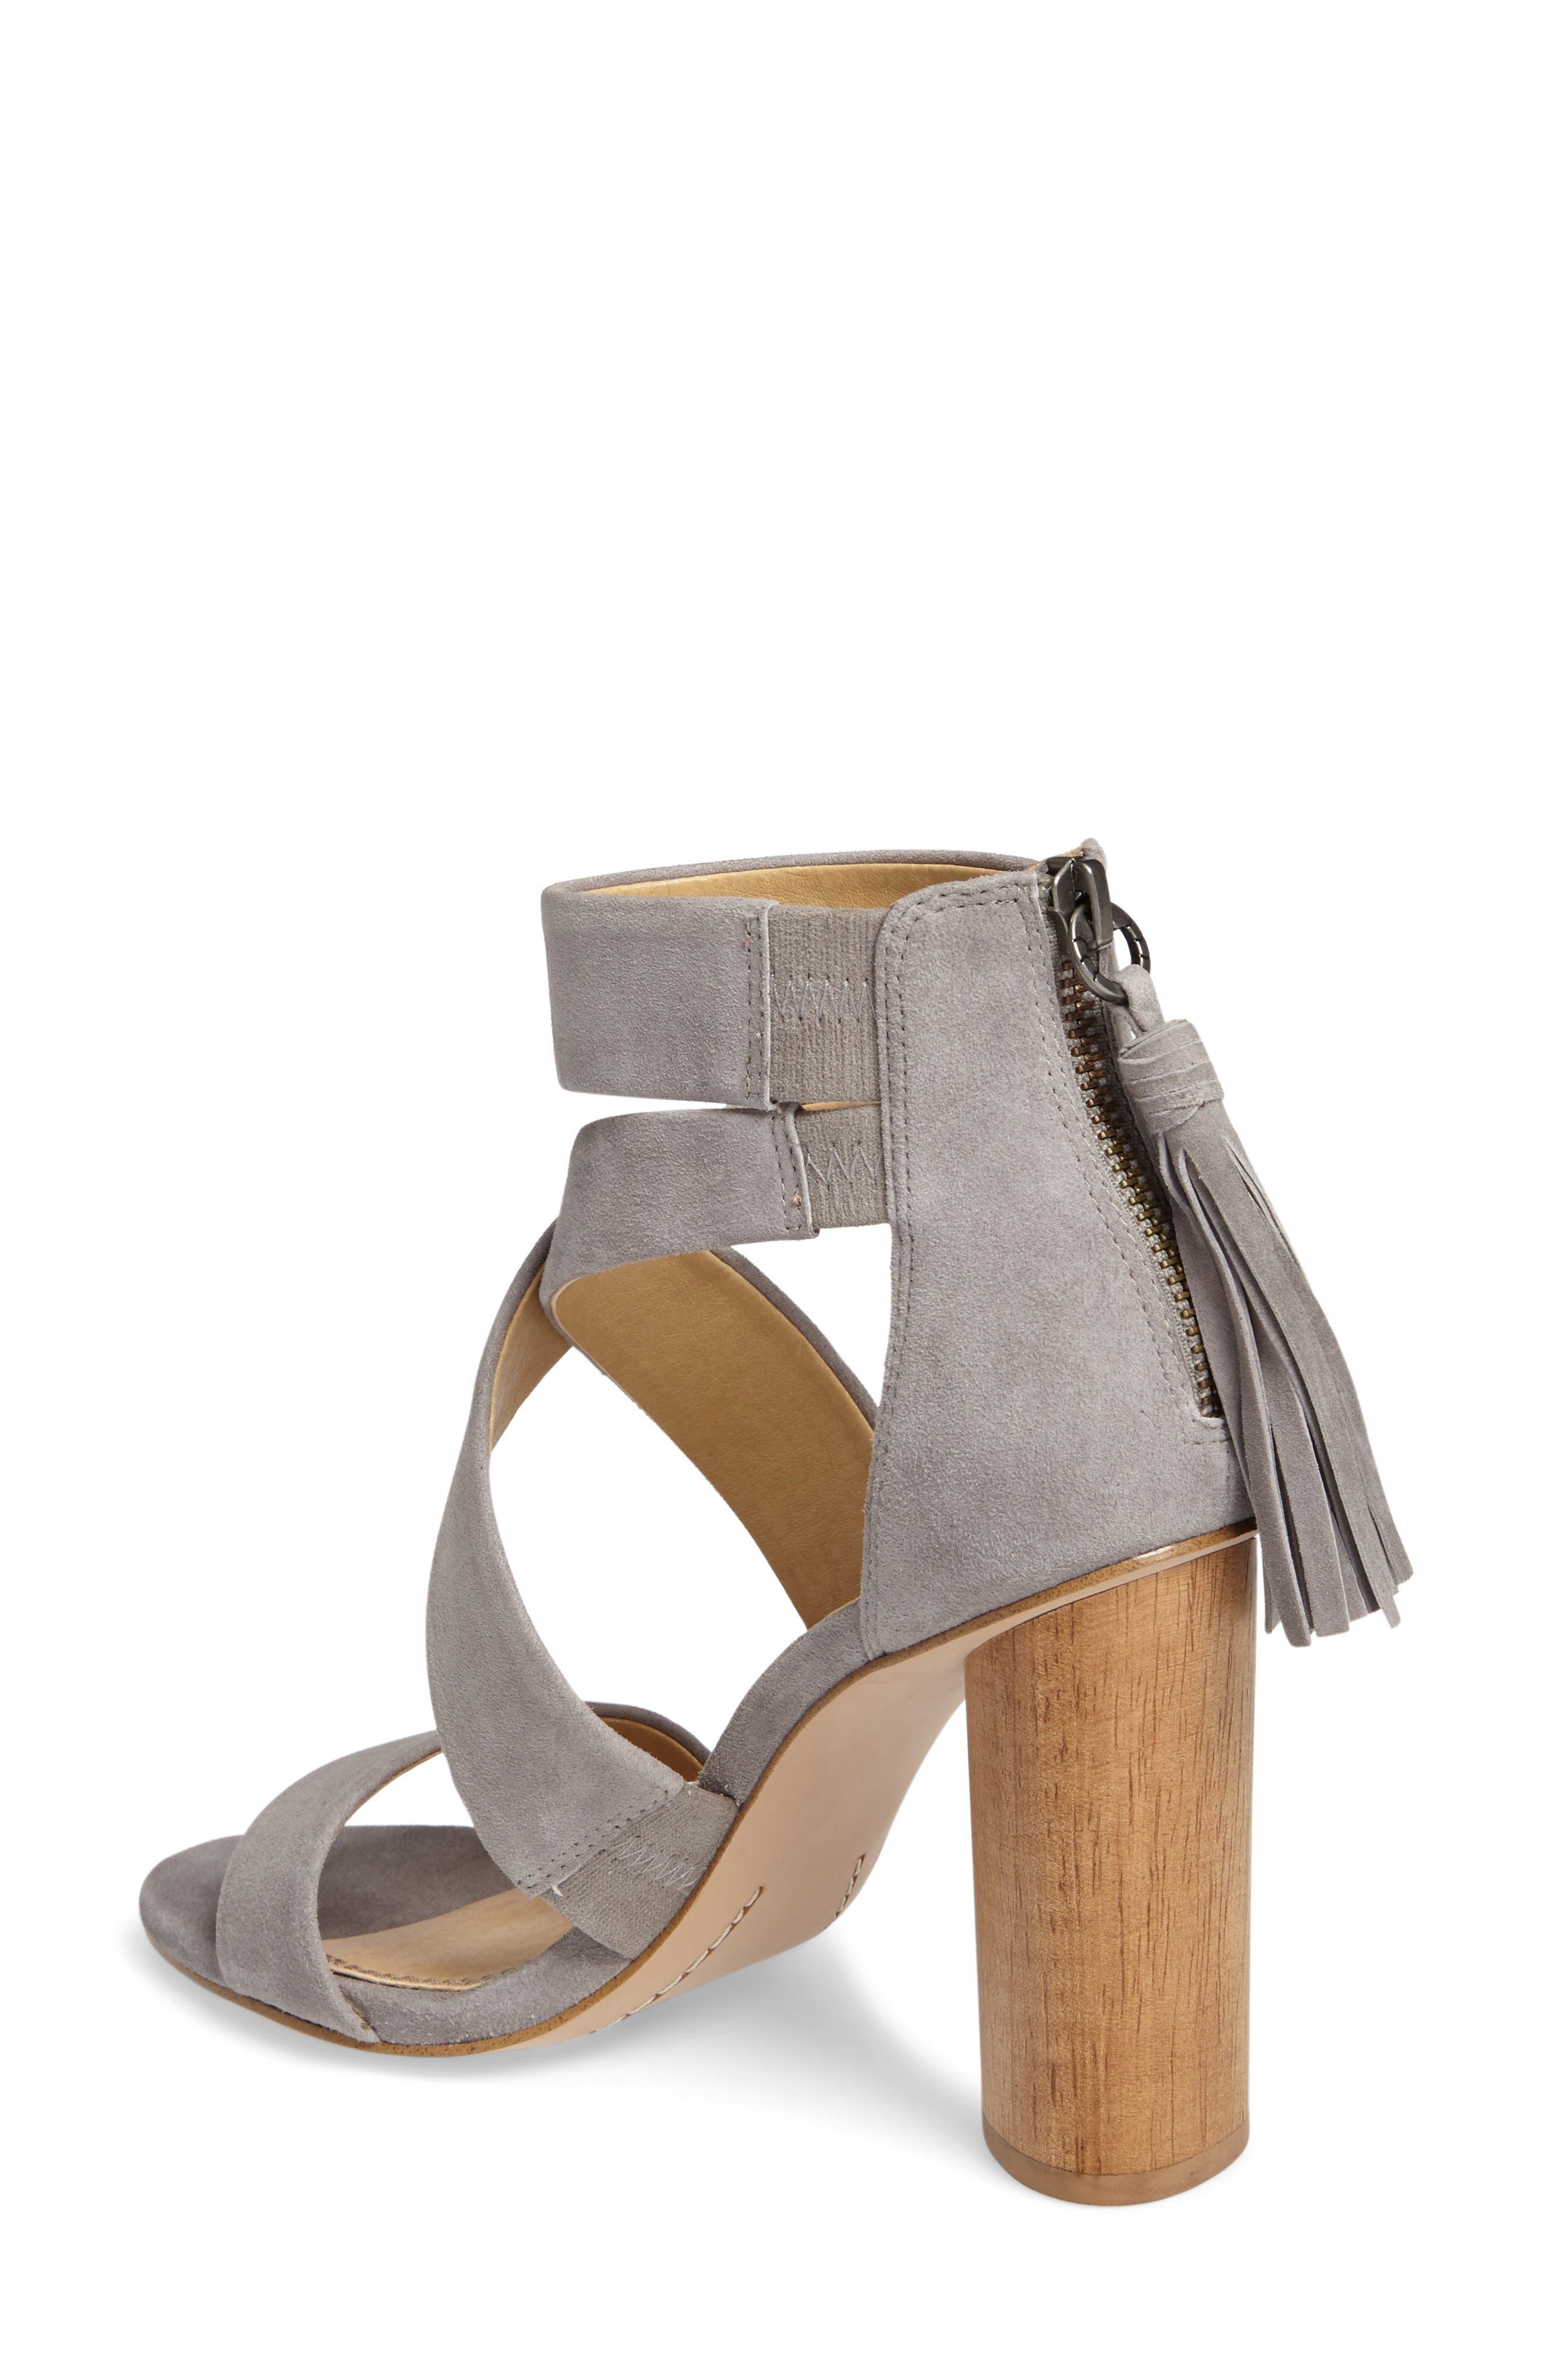 Jara Statement Heel Sandal,                             Alternate thumbnail 2, color,                             Light Grey Suede